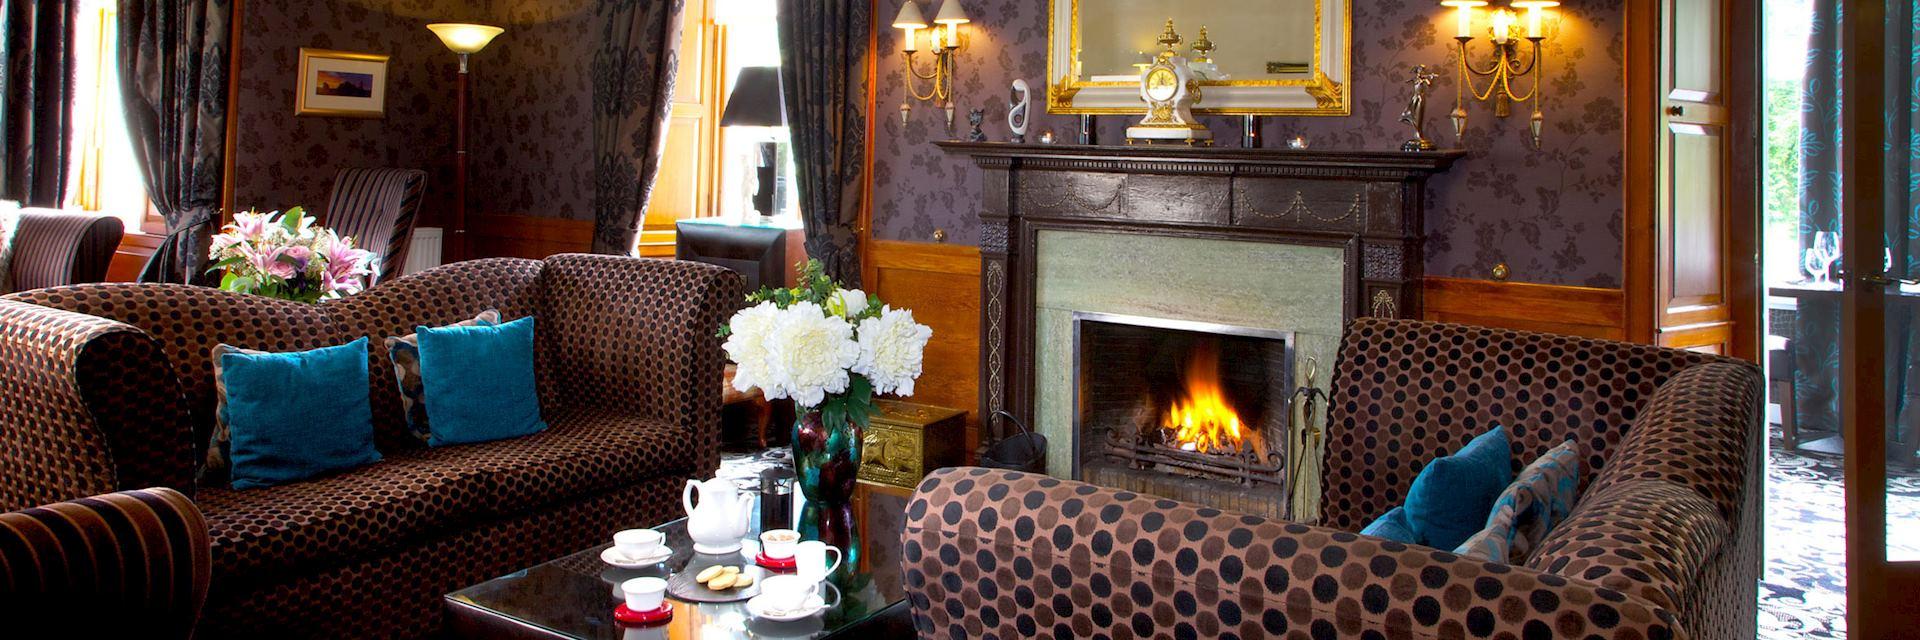 Duisdale House Hotel, Isle of Skye